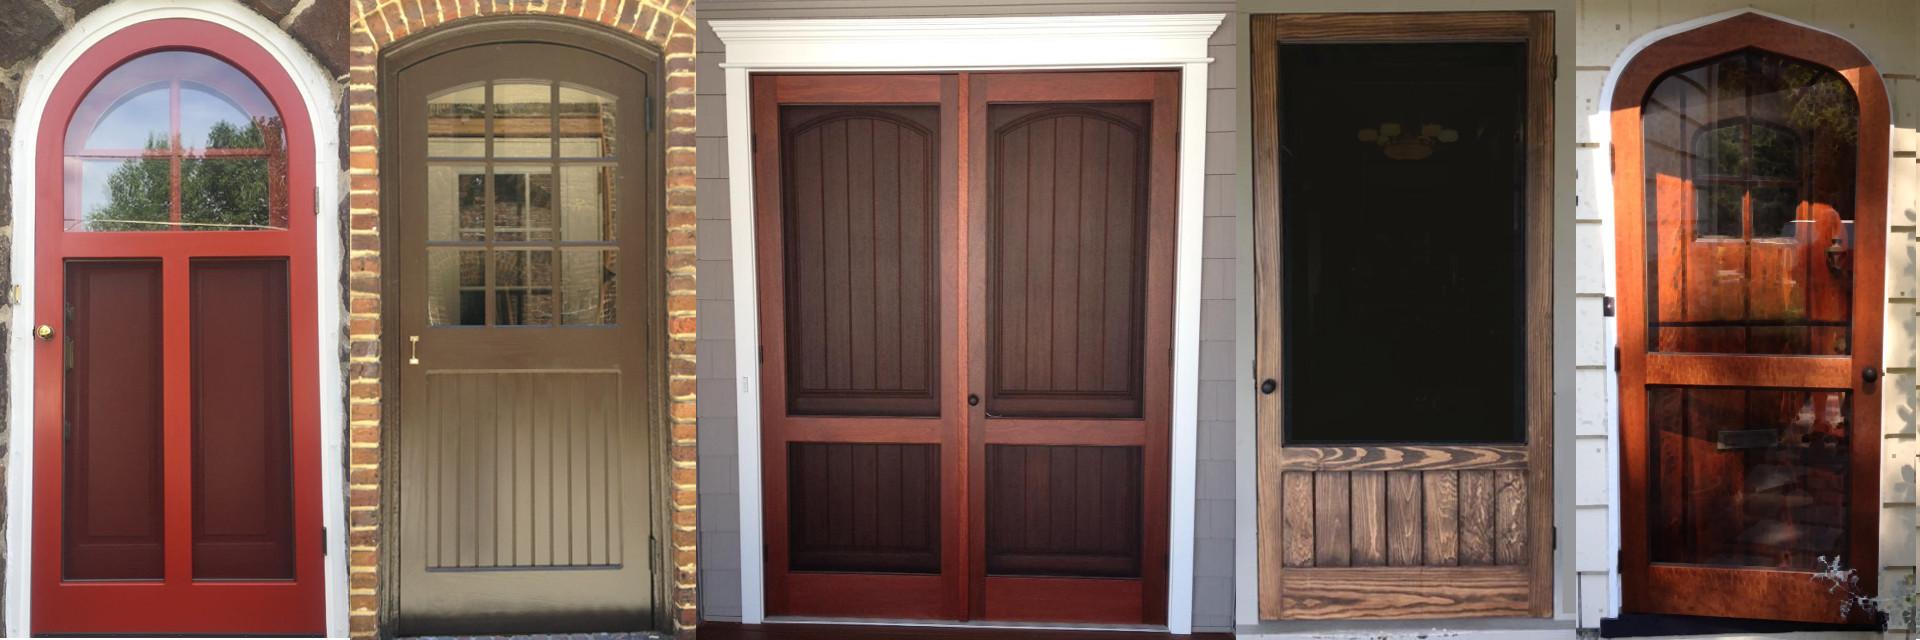 wood storm doors from Victoriana East